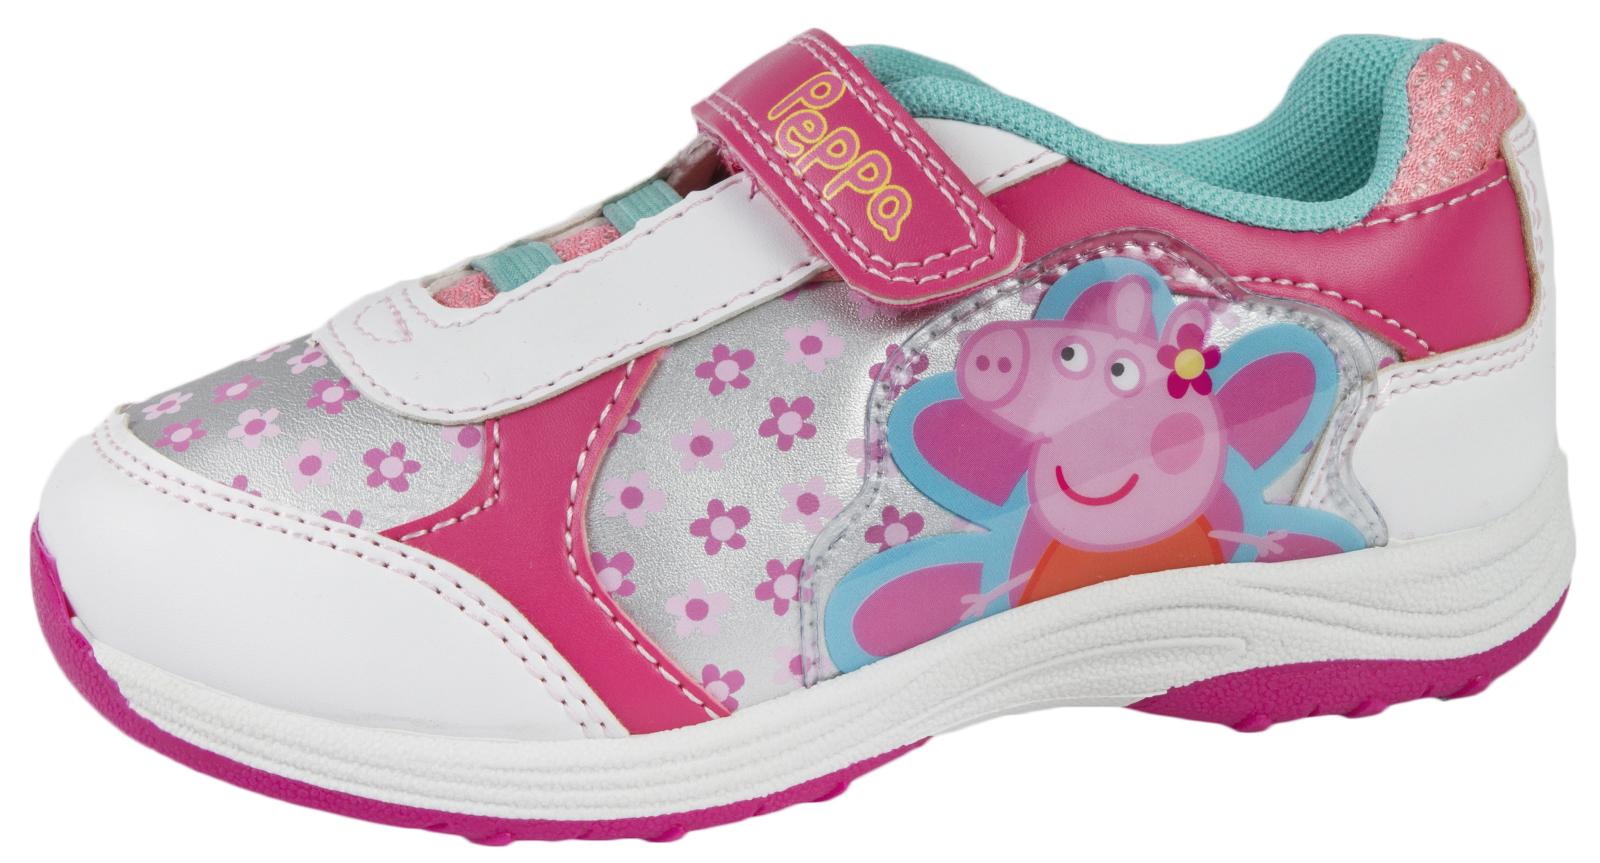 Niñas Peppa Pig Gama Zuecos Zapatillas jaleas sandalias niños Jalea Zapatos Talla 5-10